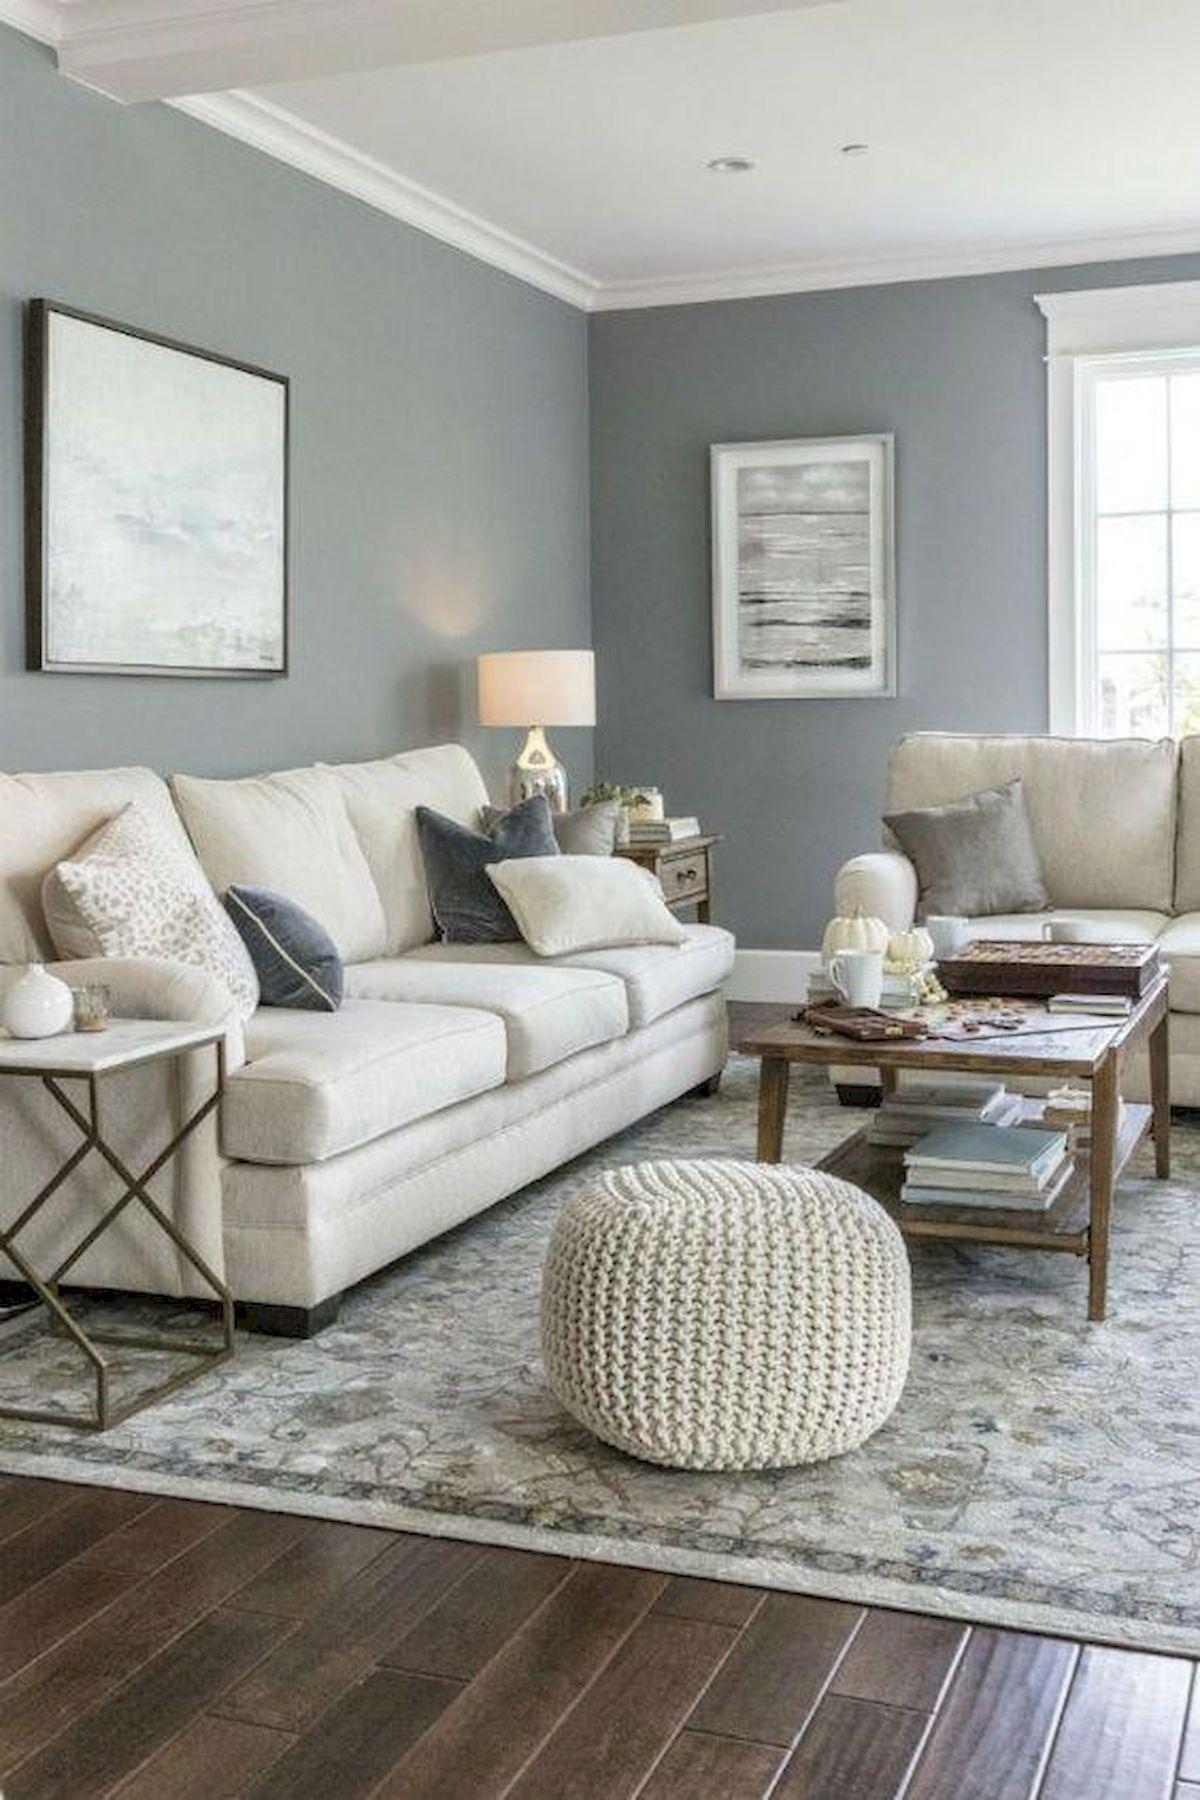 45 Brilliant DIY Living Room Design and Decor Ideas for Small Apartment (34)